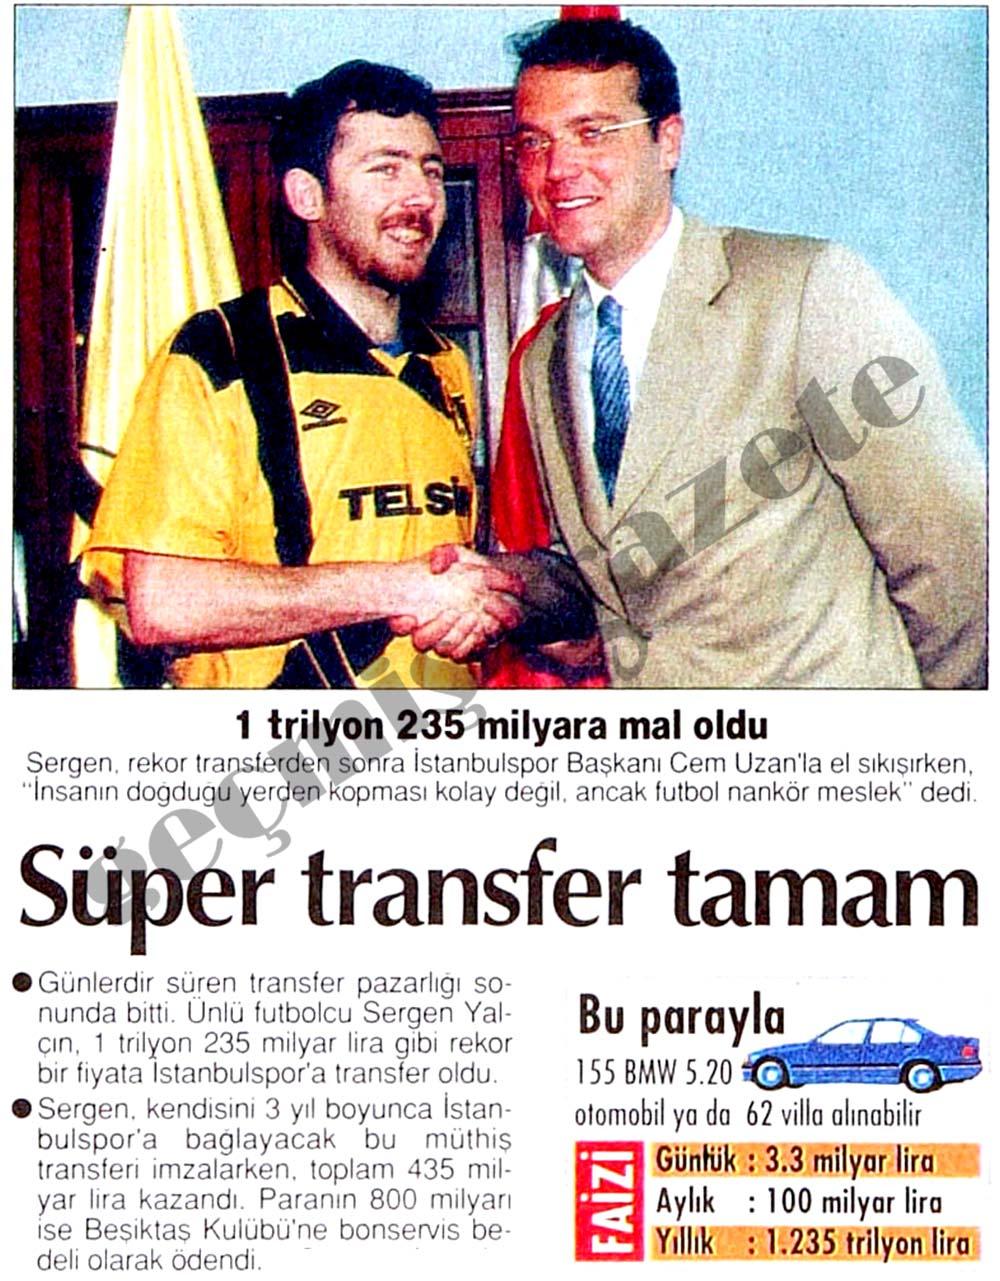 Süper transfer tamam